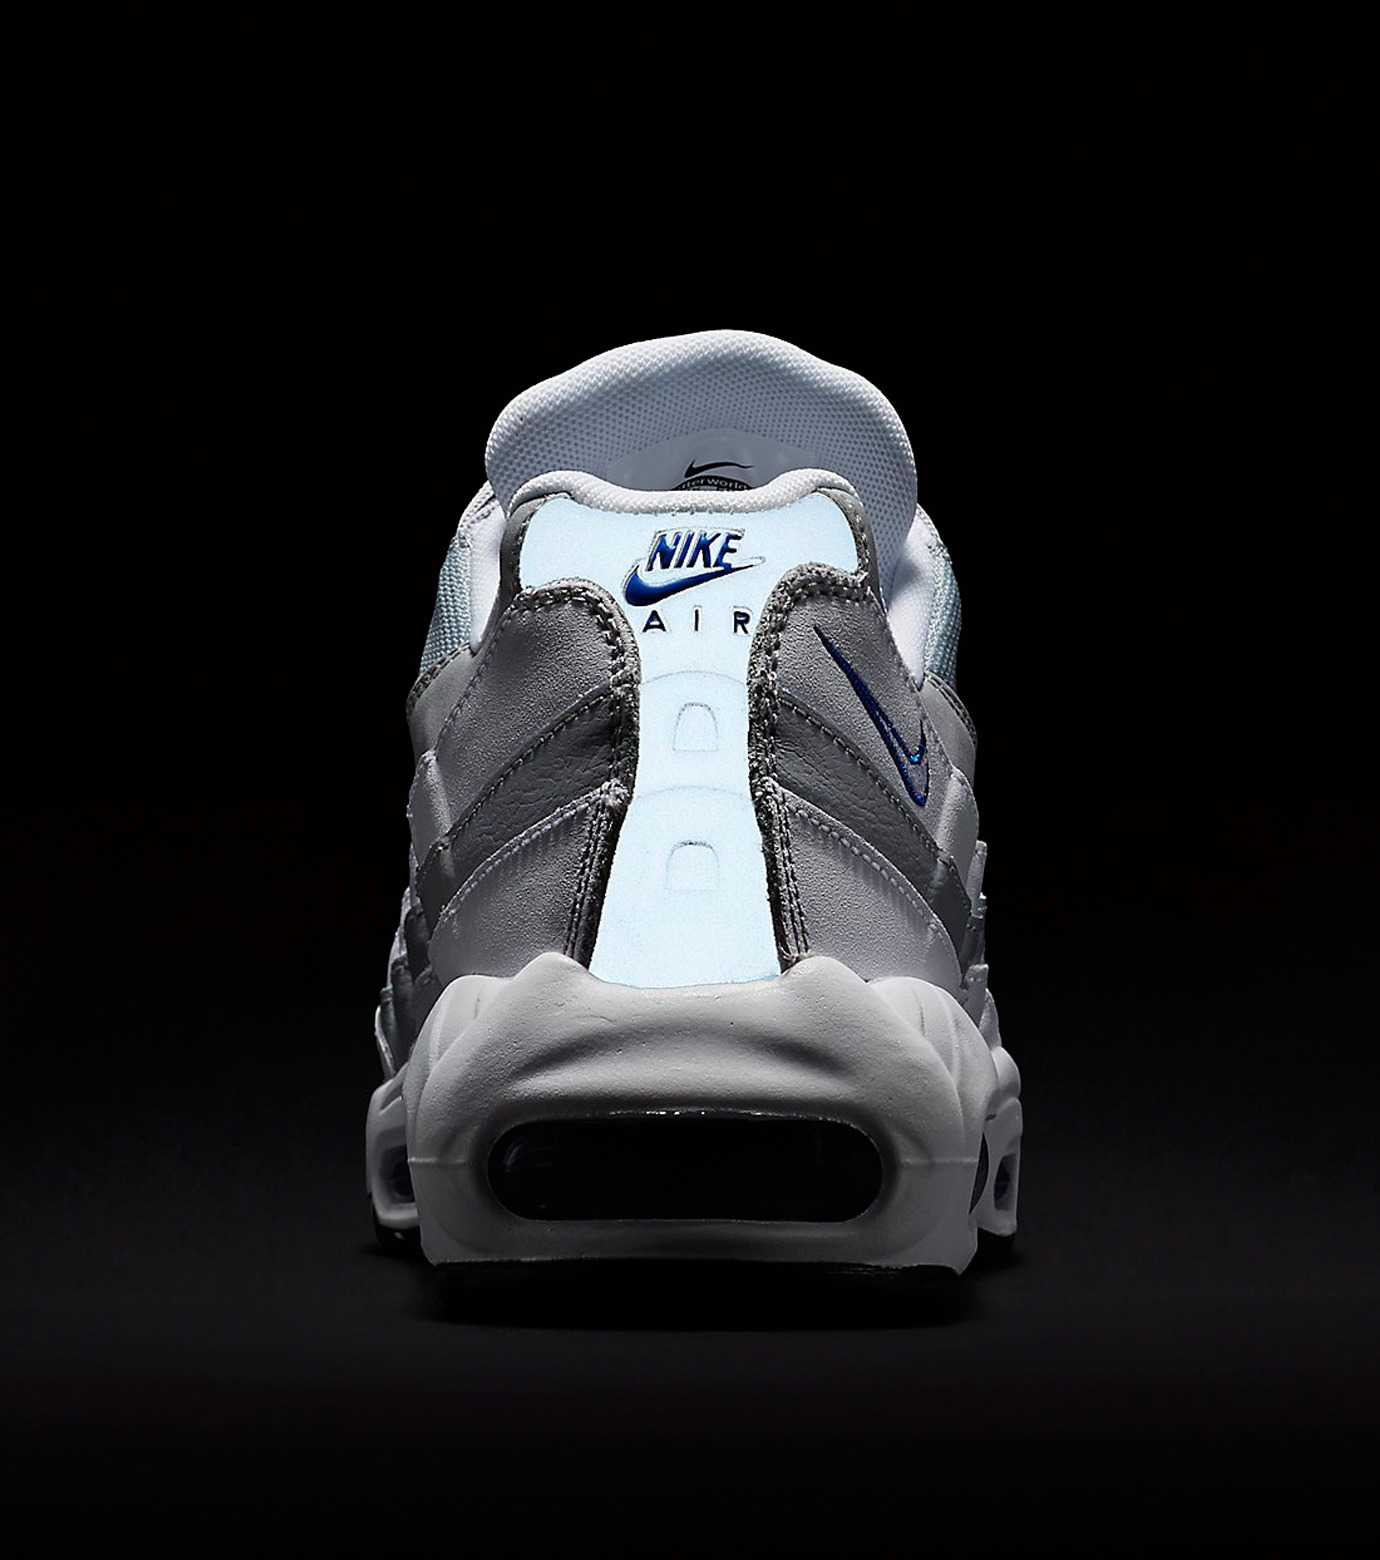 NIKE(ナイキ)のAIR MAX 95 ESSENTIAL-WHITE(シューズ/shoes)-749766-104-4 拡大詳細画像7